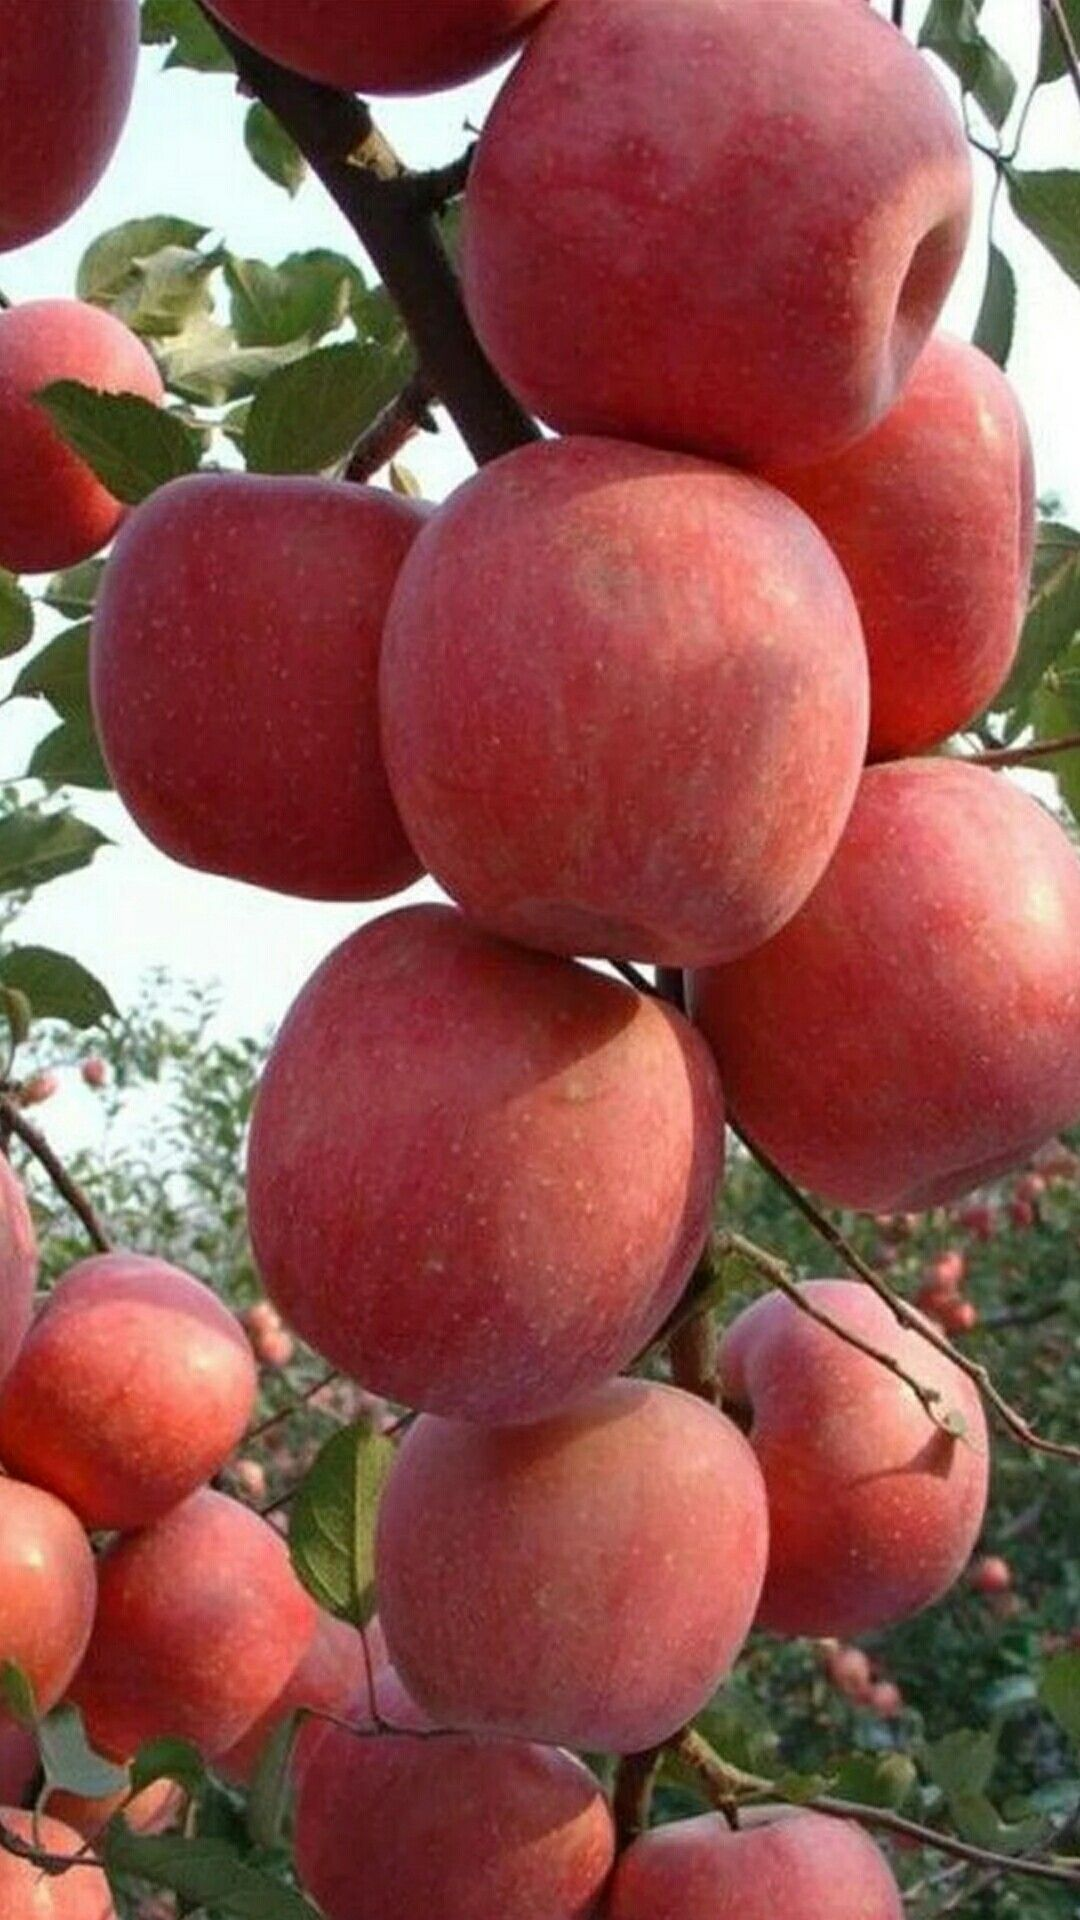 Pomegranate Deserts Drinks Fruit Postres Dessert Drink Desserts Garnet